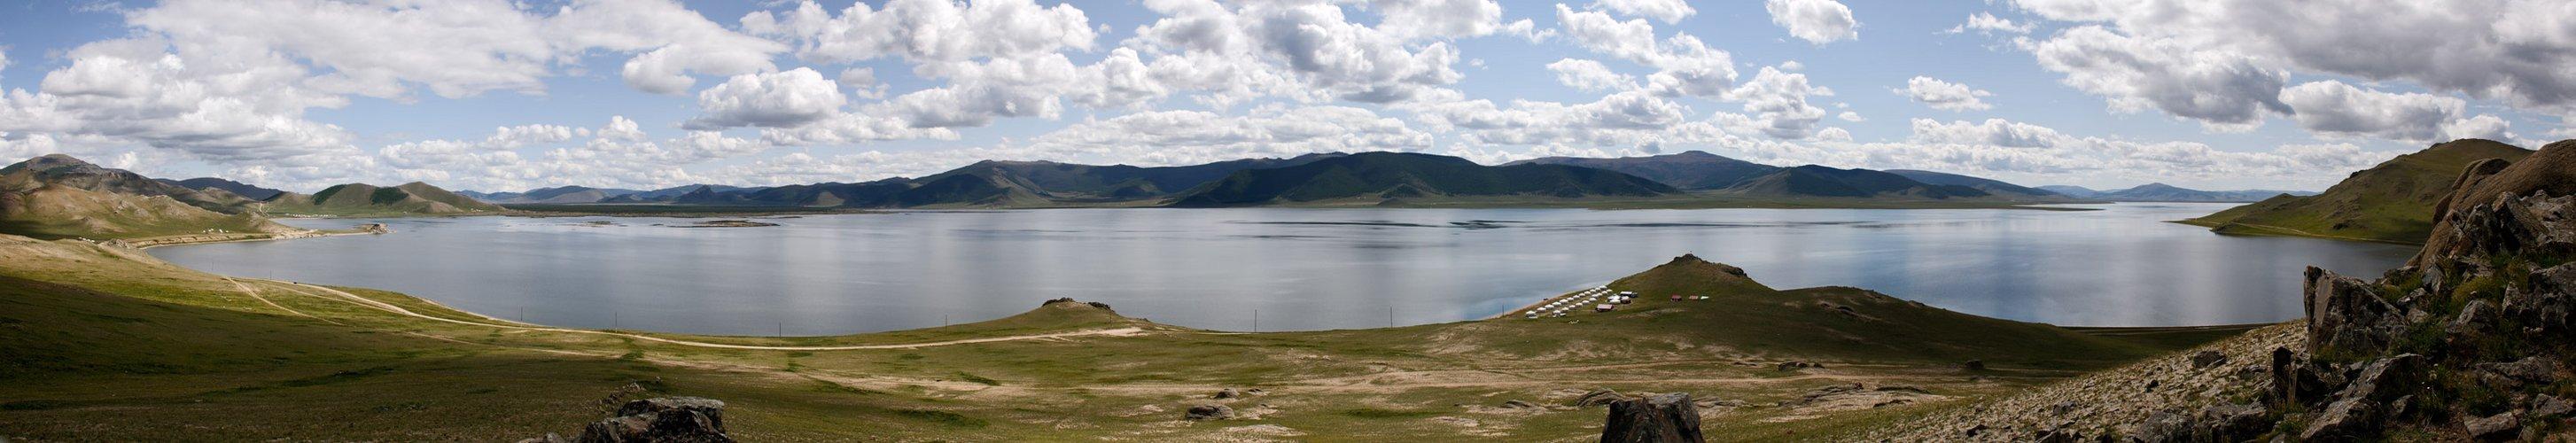 Mongolei-Weisser See